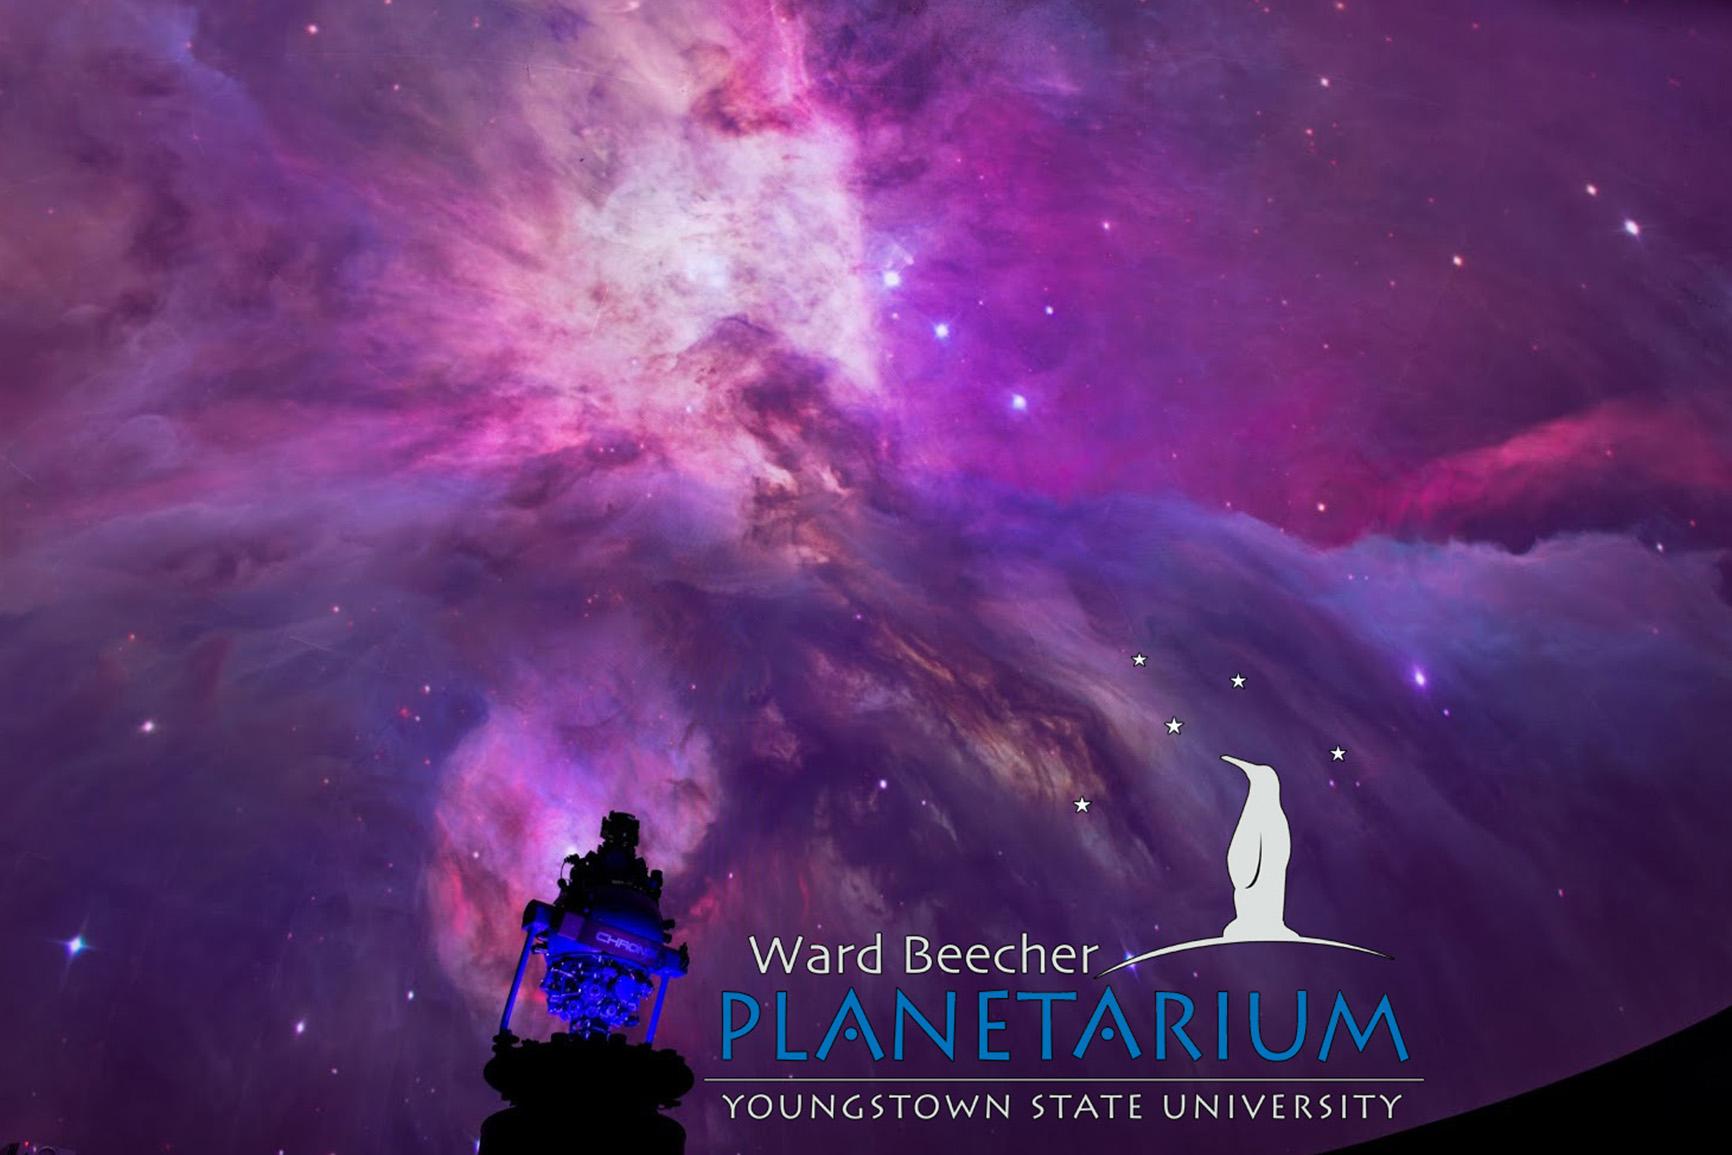 Ward-Beecher-Planetarium